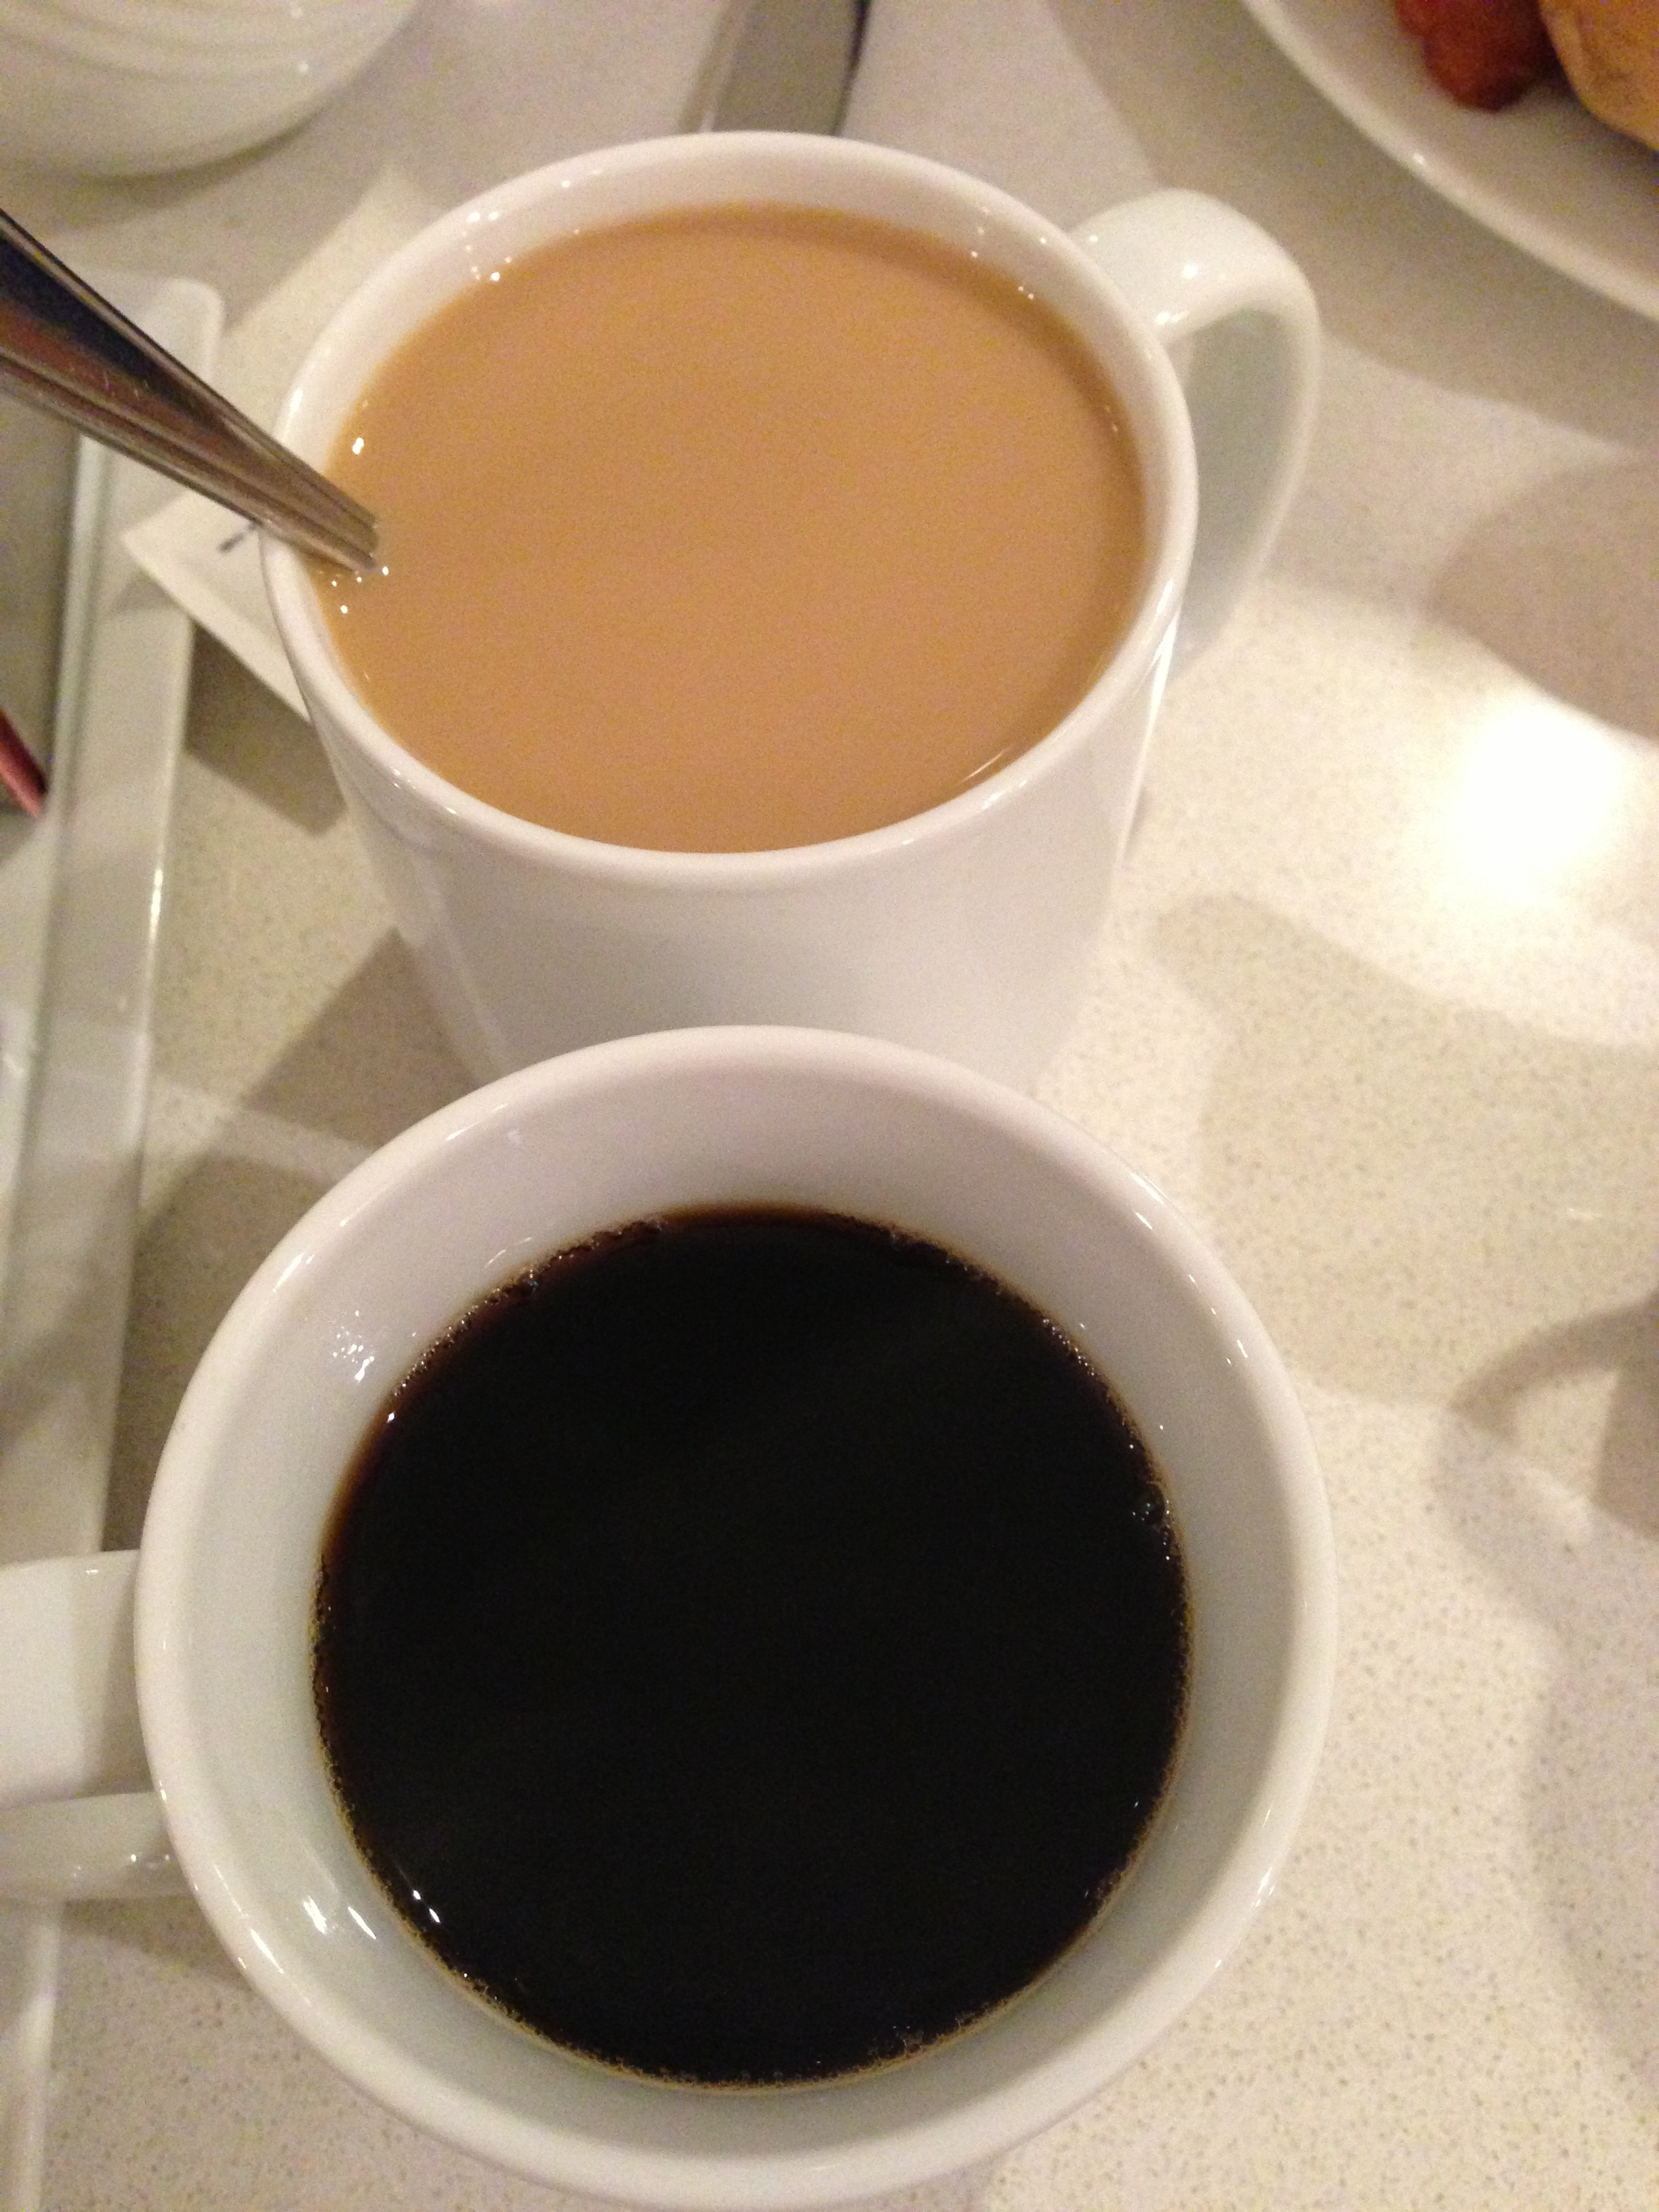 black coffee and creamer coffee